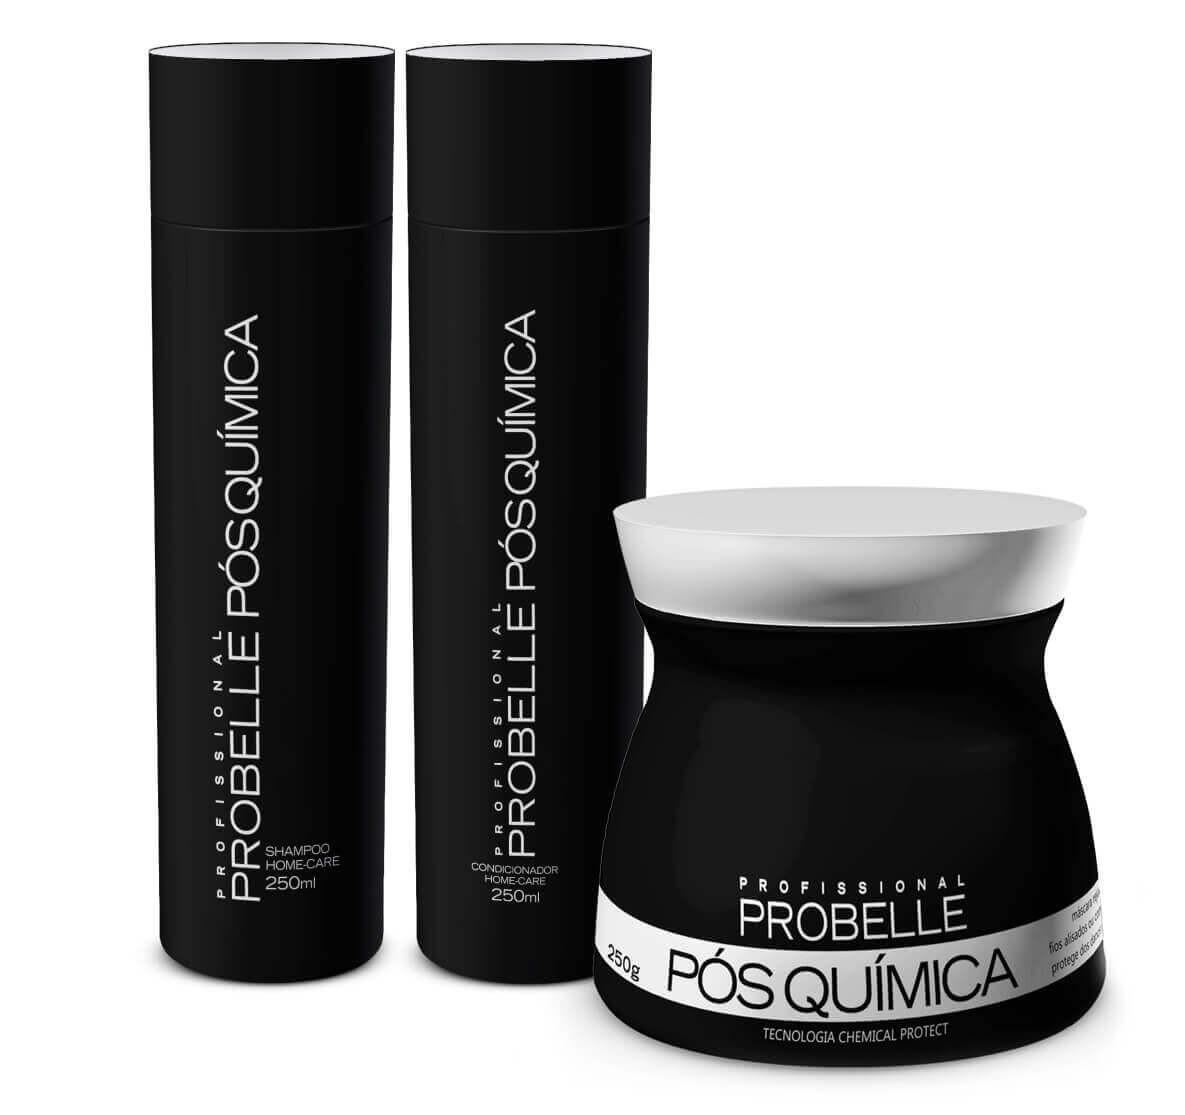 Comprar Probelle Kit Pós Química Profissional (kit 3 produtos) - 250ml be2b0817caa